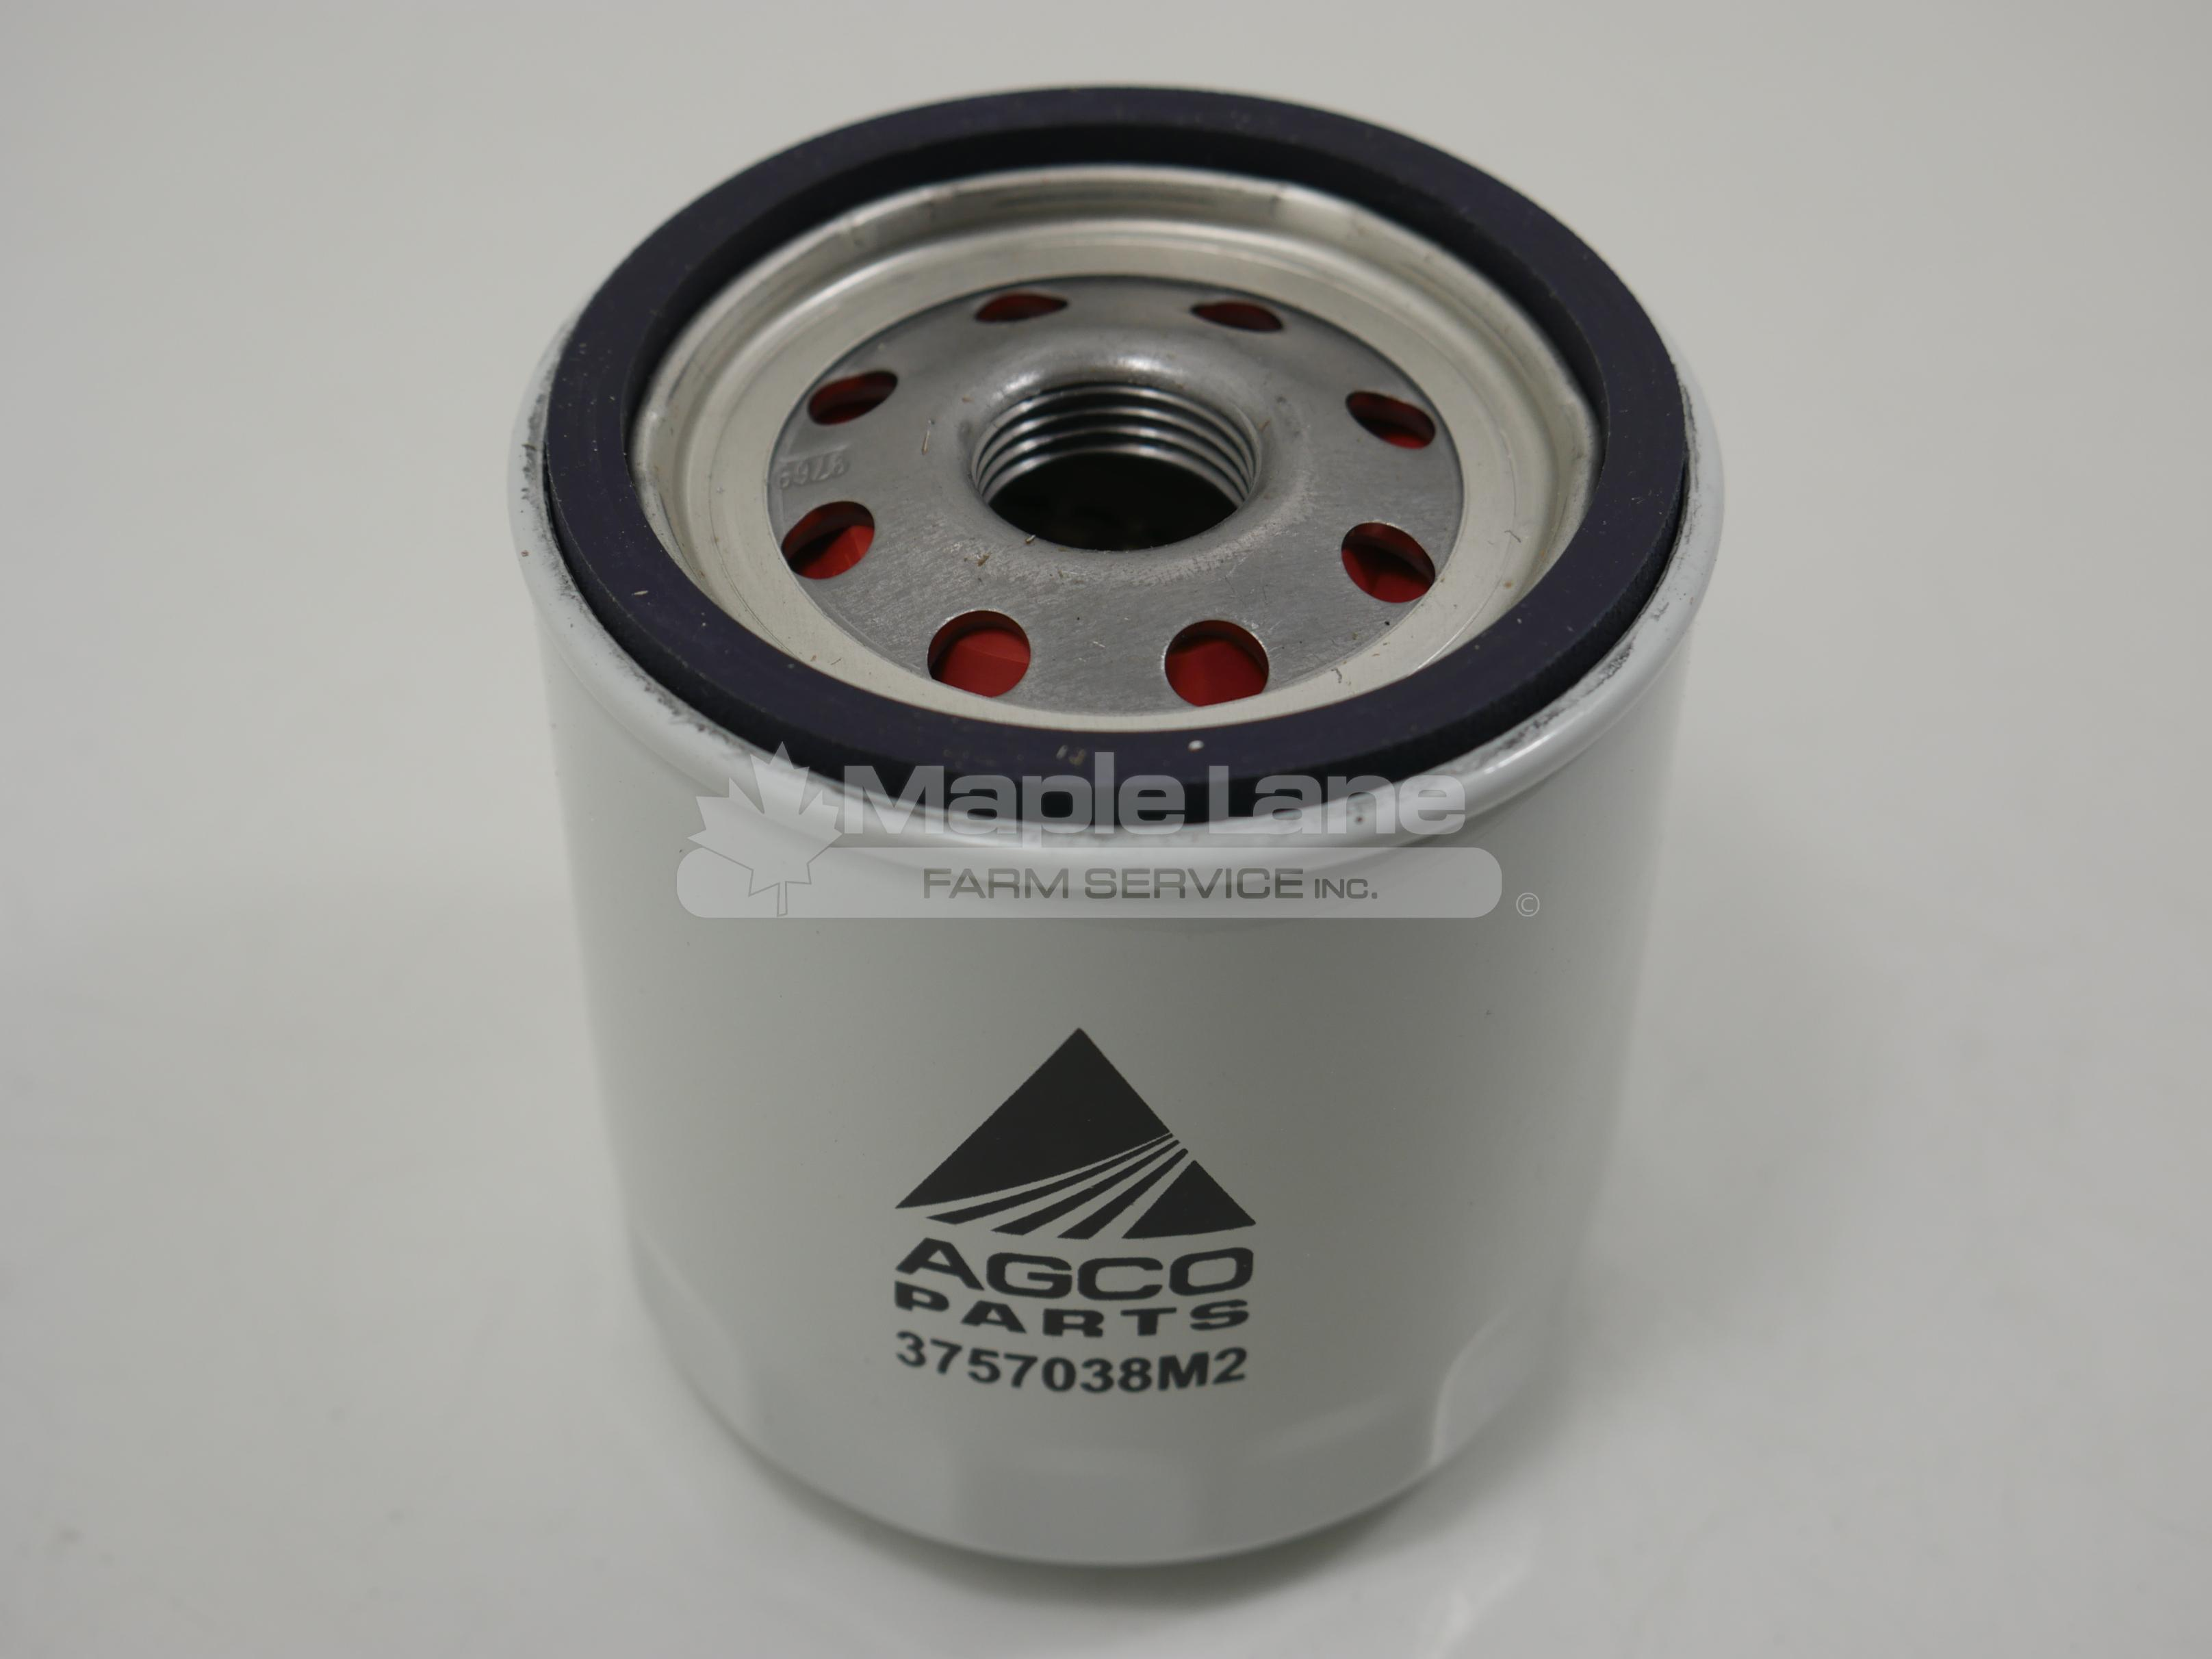 3757038M2 Oil Filter